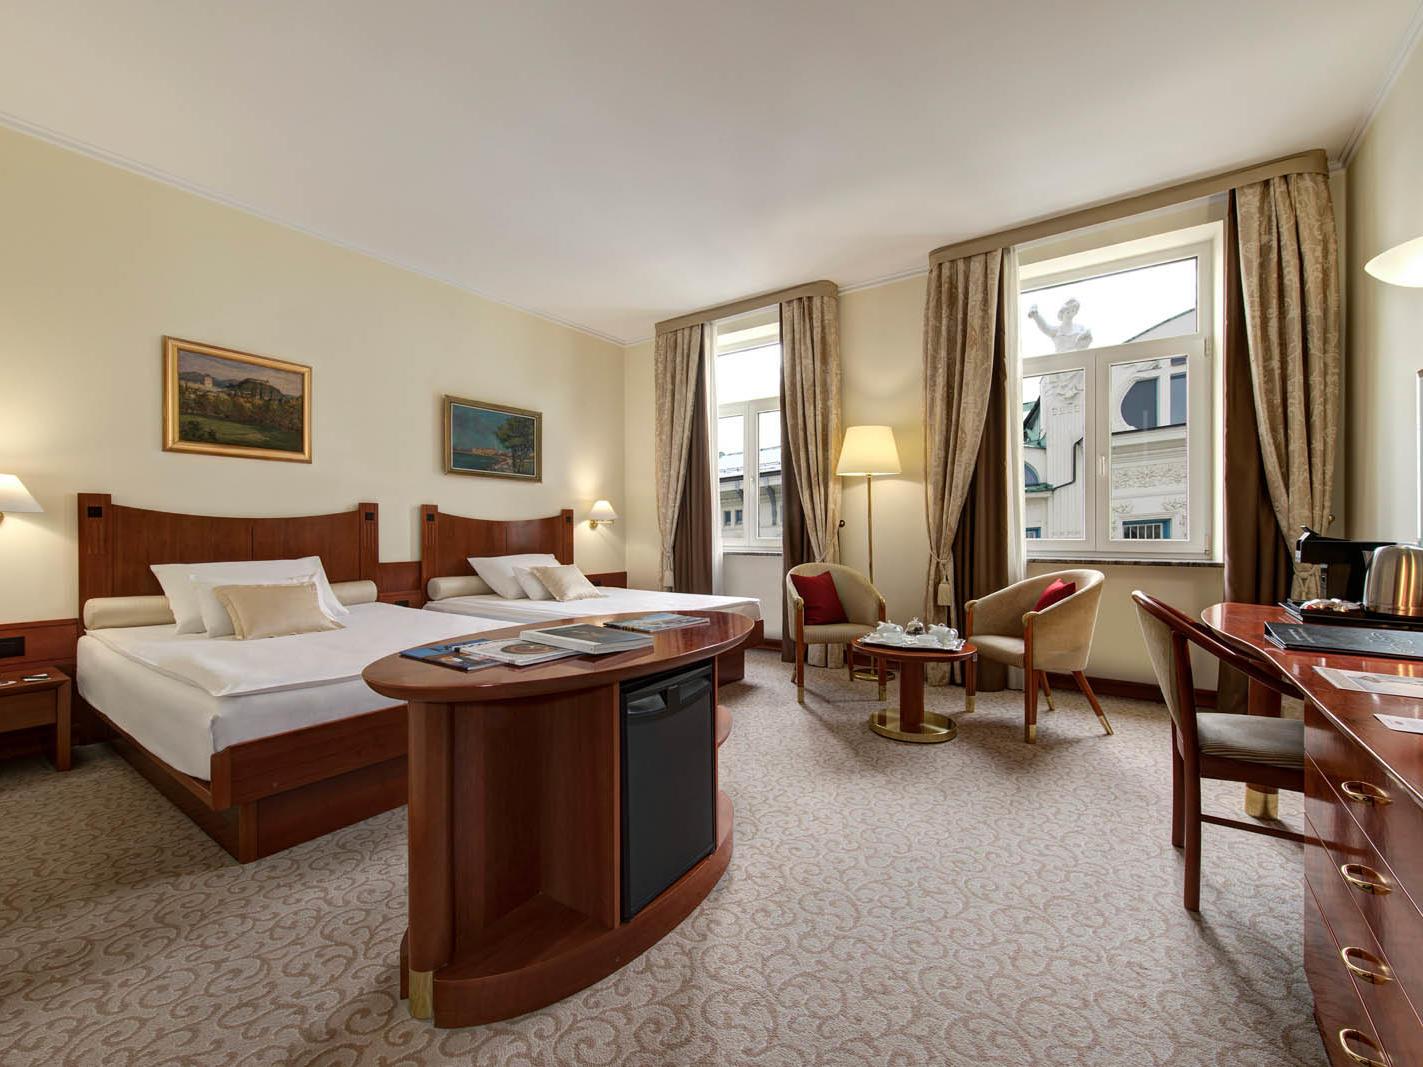 Deluxe Room Grand hotel Union